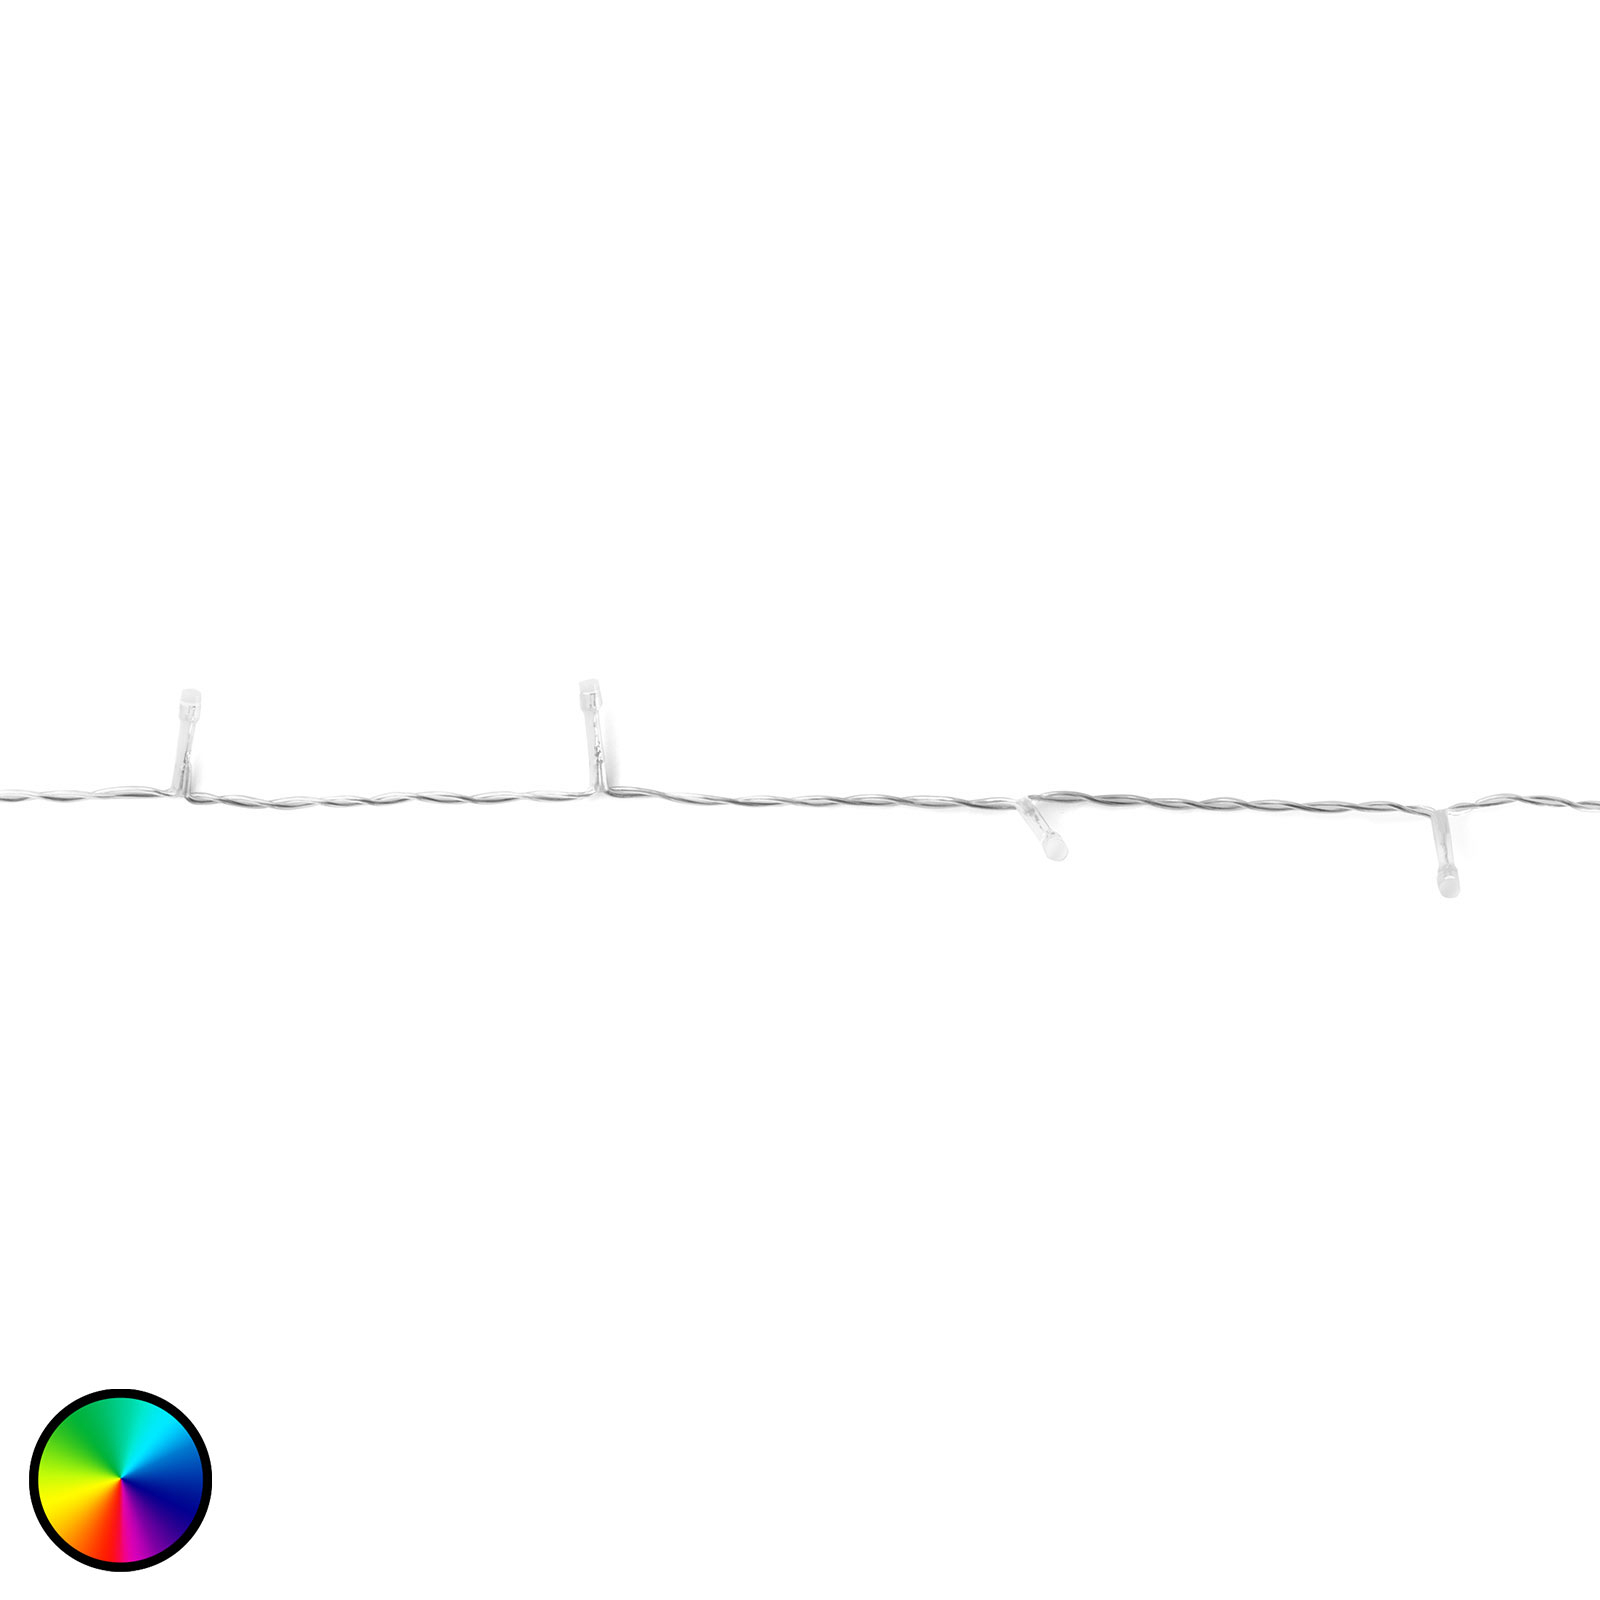 Lichterkette Twinkly RGBW, 250-fl. 20m transparent